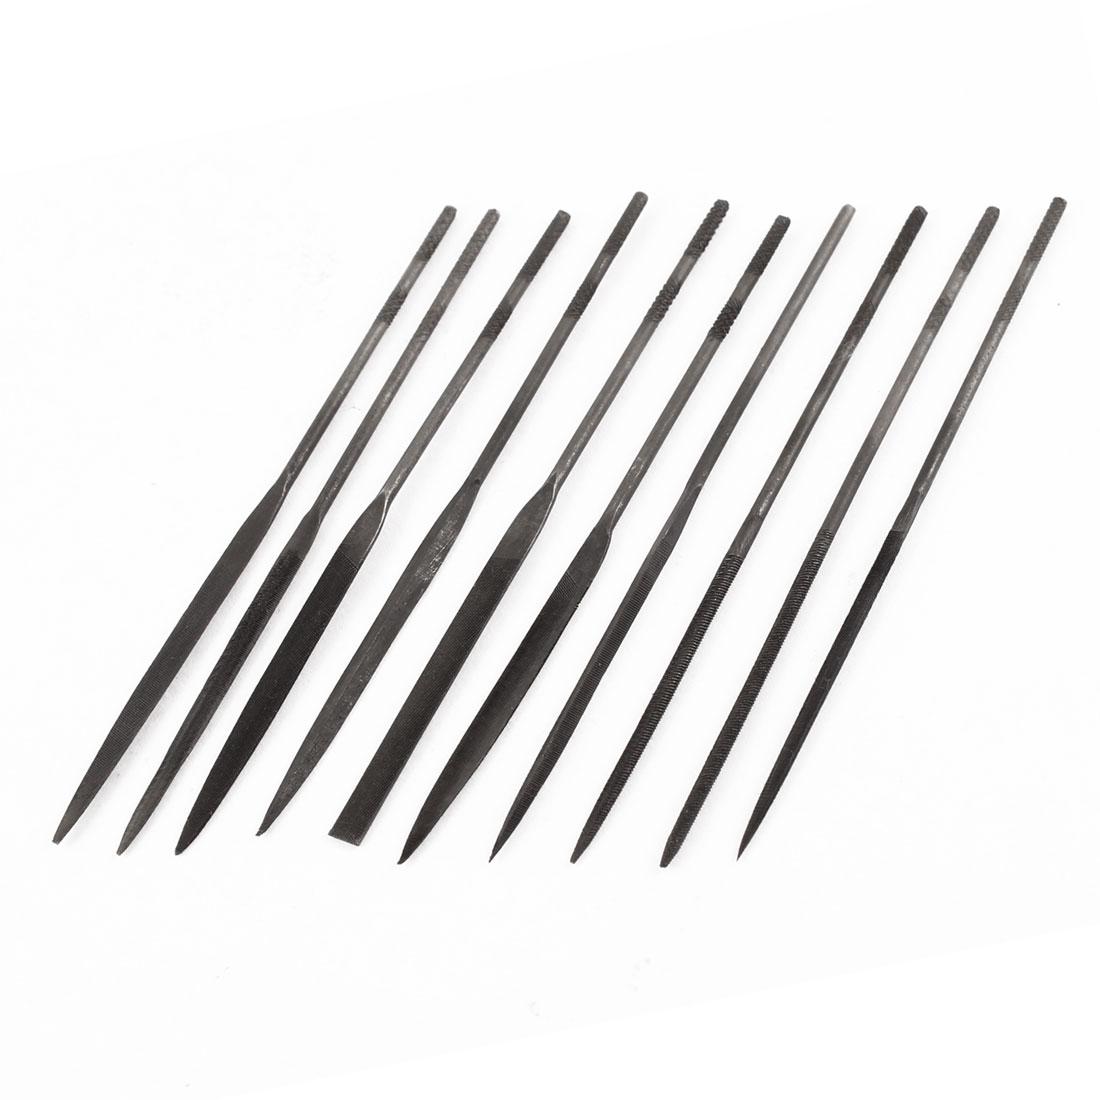 10 Pcs Metal Diamond Wood Carving Craft Mini Needle File 2 x 100mm